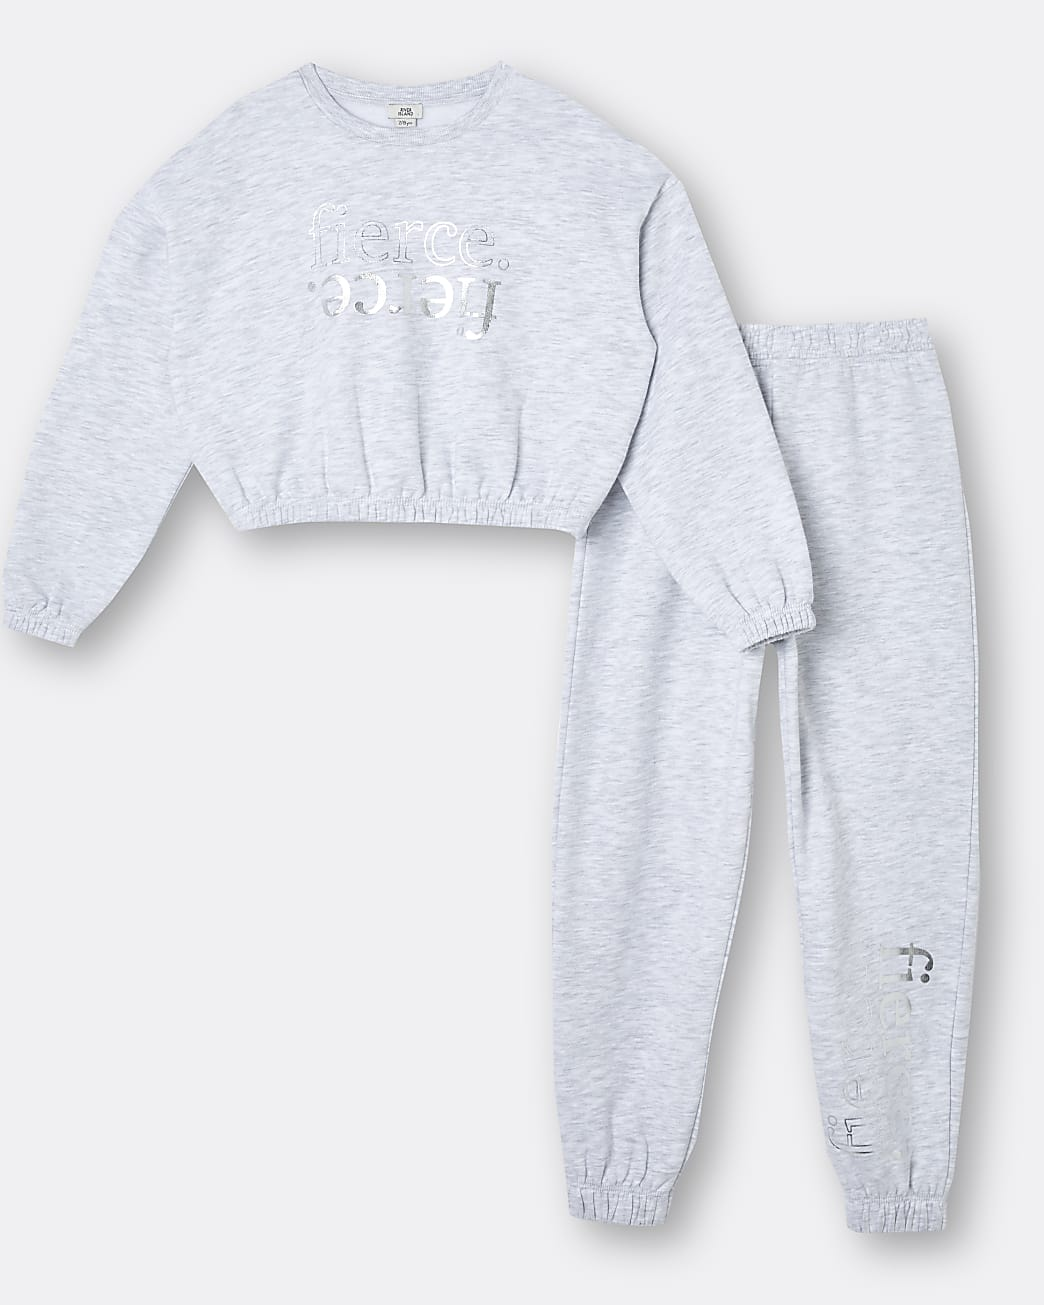 Girls grey 'Fierce' cinch sweatshirt outfit